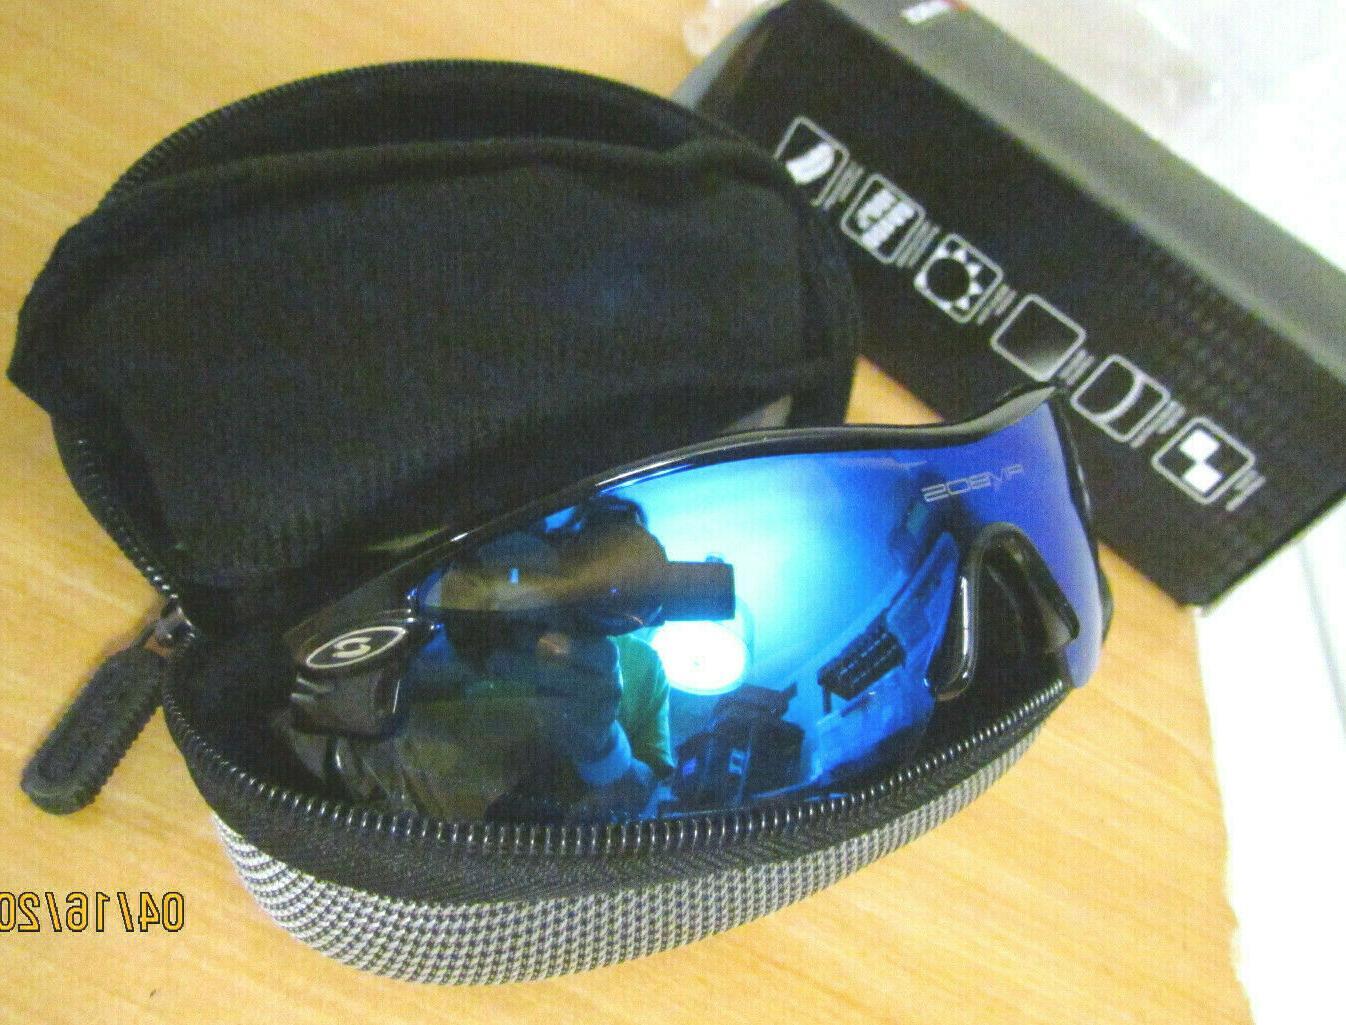 polarized sunglasses 4 lenses woolike uv sport